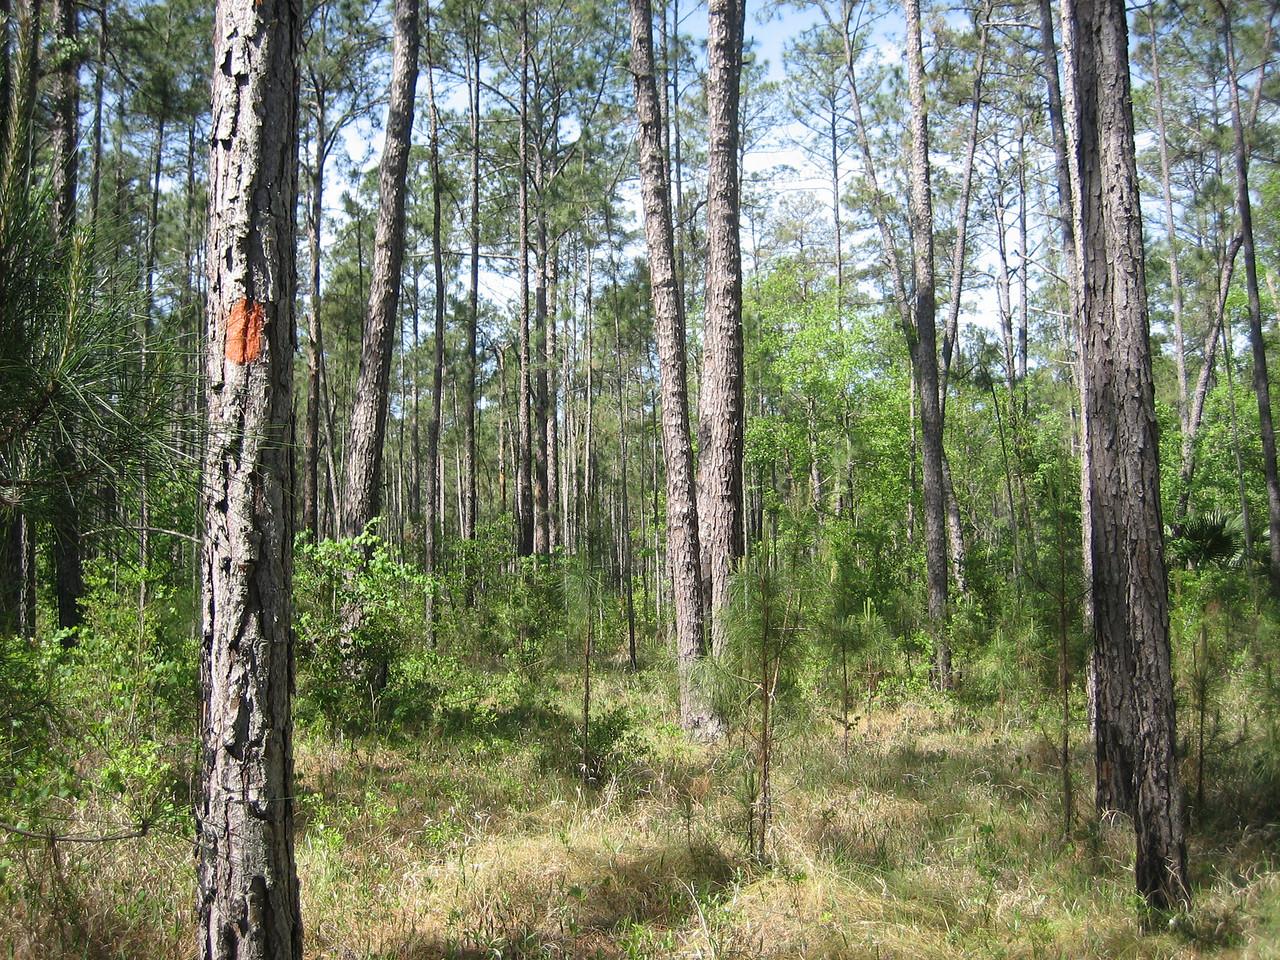 Hiking through the pines near Hulls Creek<br /> photo credit: Sandra Friend / Florida Trail Association